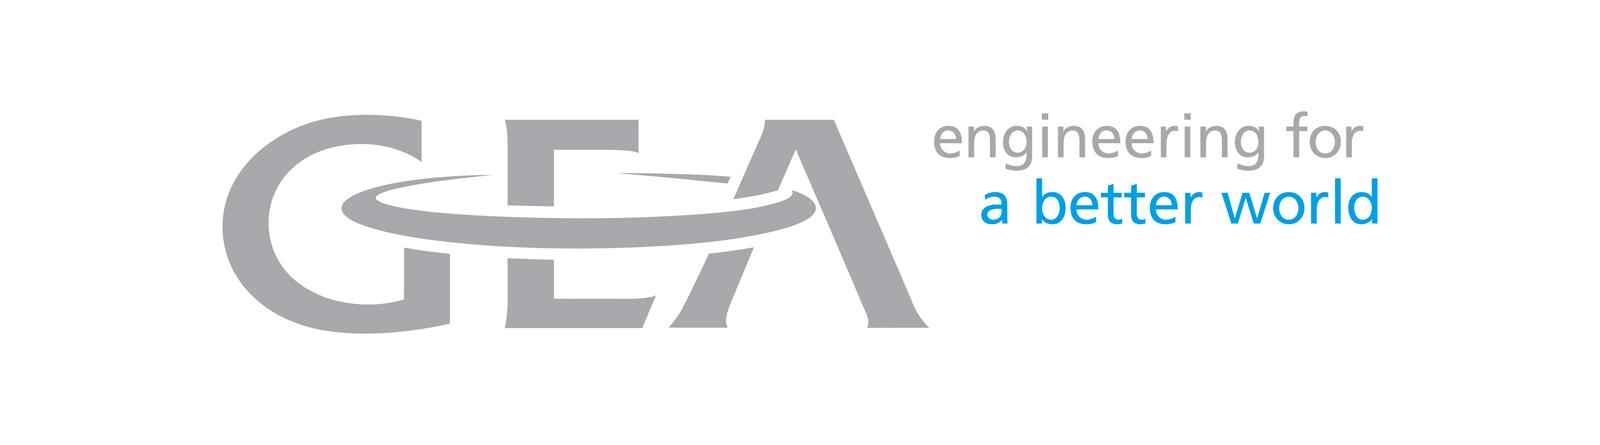 AES Drilling Fluids logo